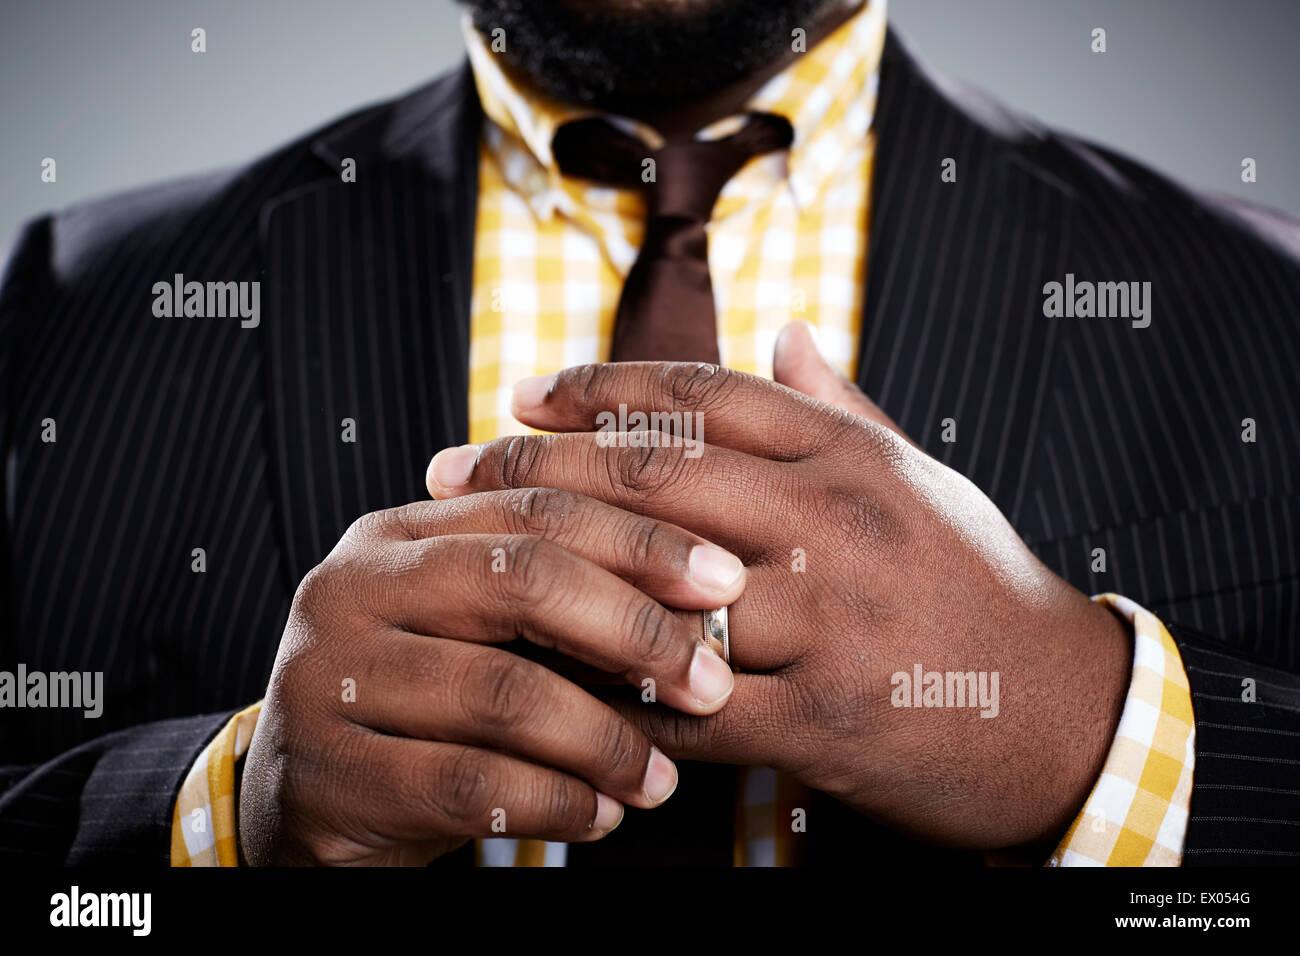 Close Up retrato de estudio de mediados de adulto empresario tocando su anillo de bodas Imagen De Stock